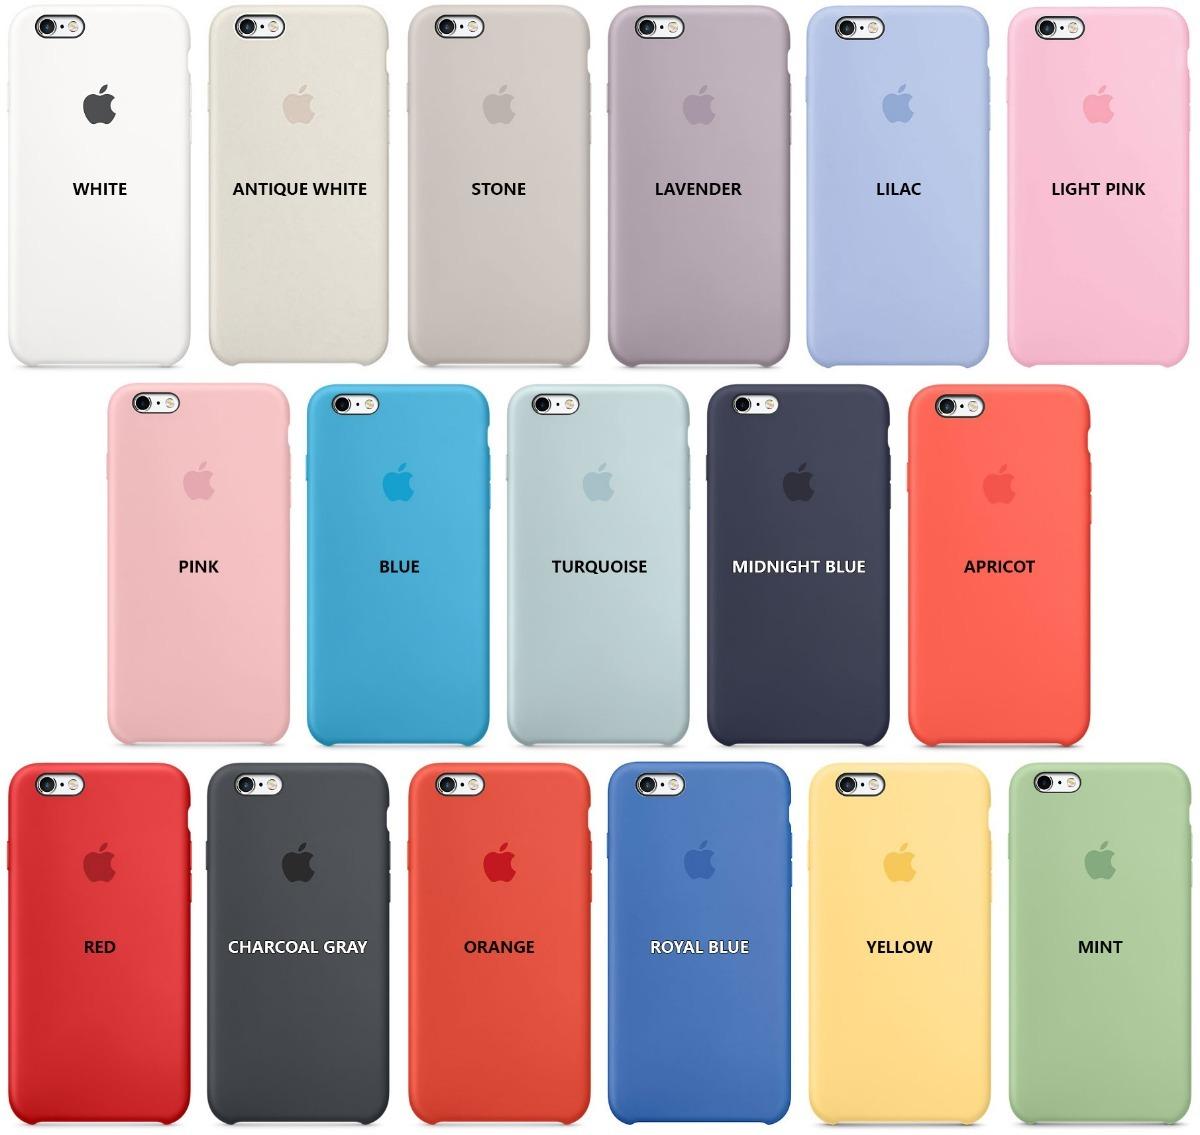 new products 29385 b29d1 Funda Silicona Soft iPhone 5 5s Se Apple Marine Green